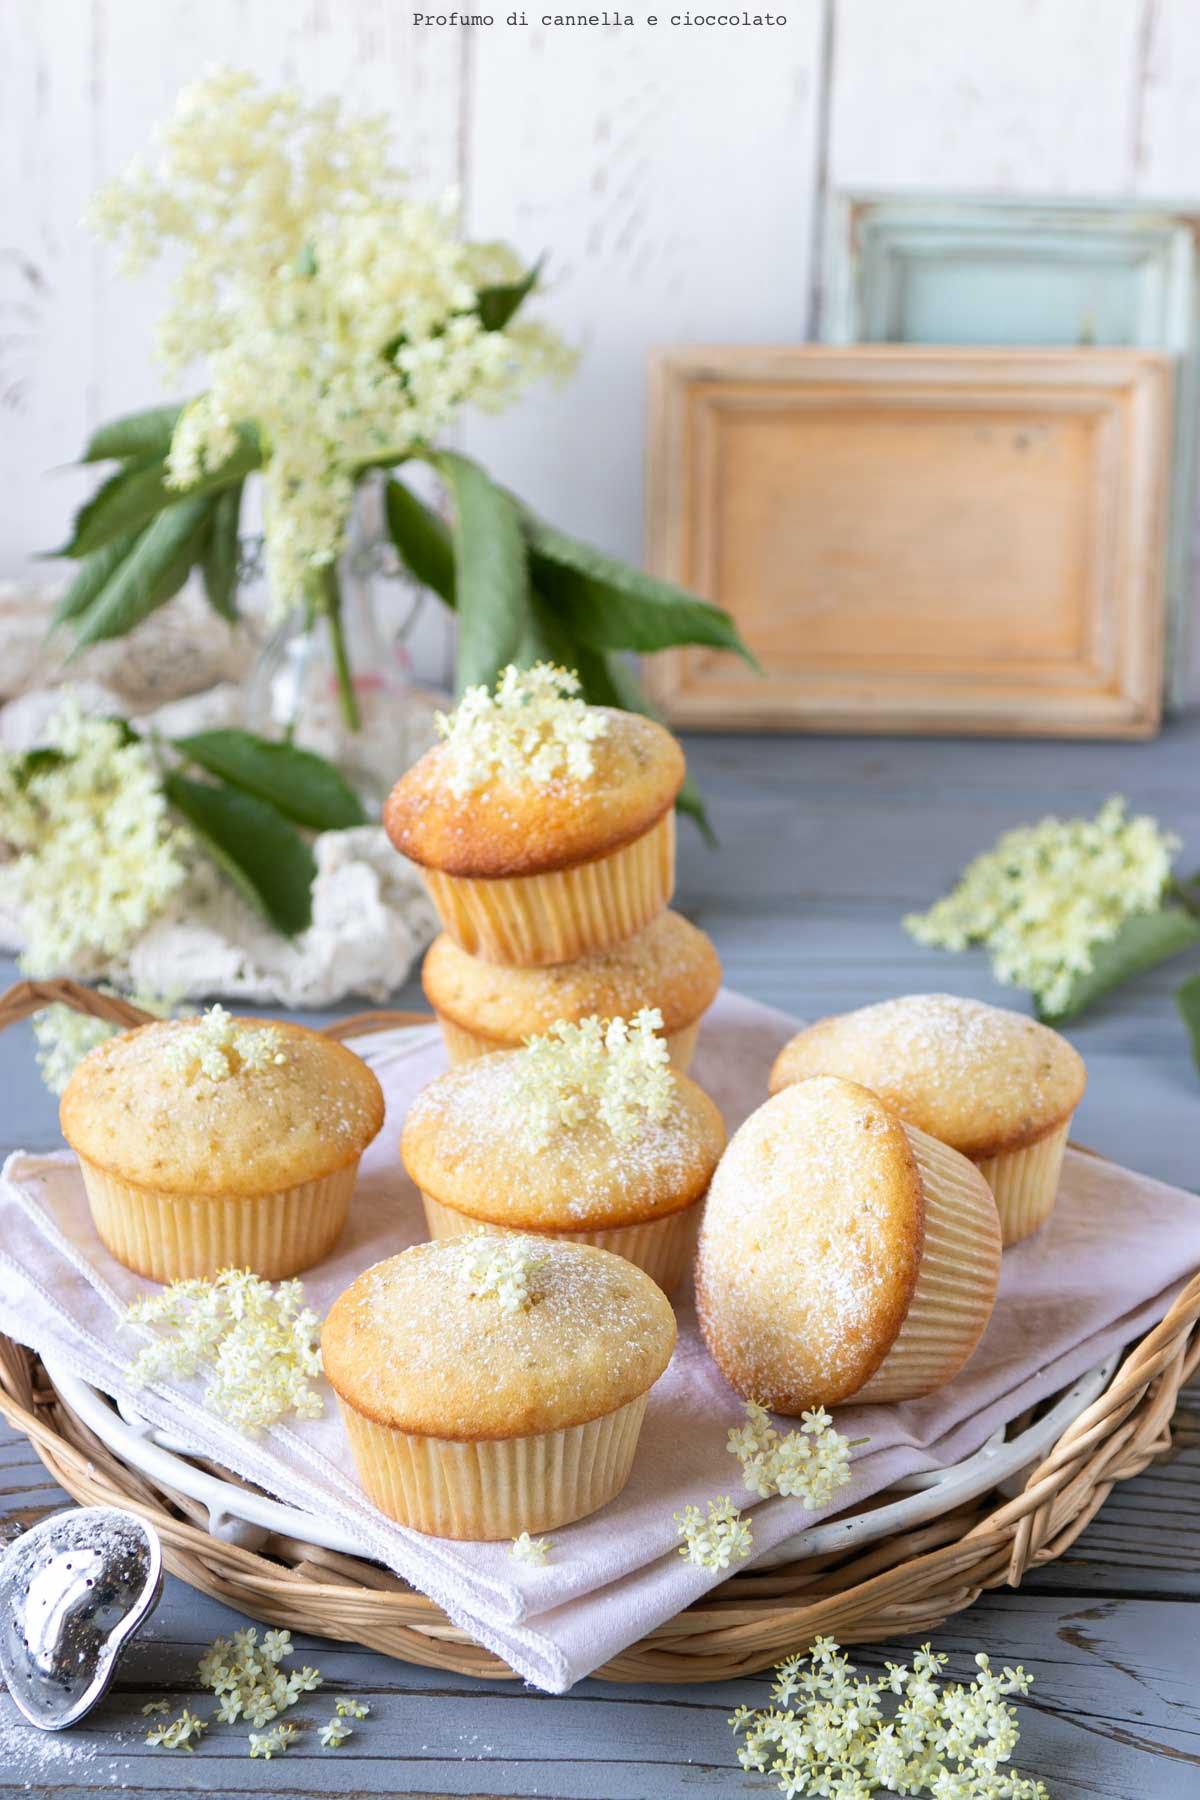 Muffin ai fiori di sambuco